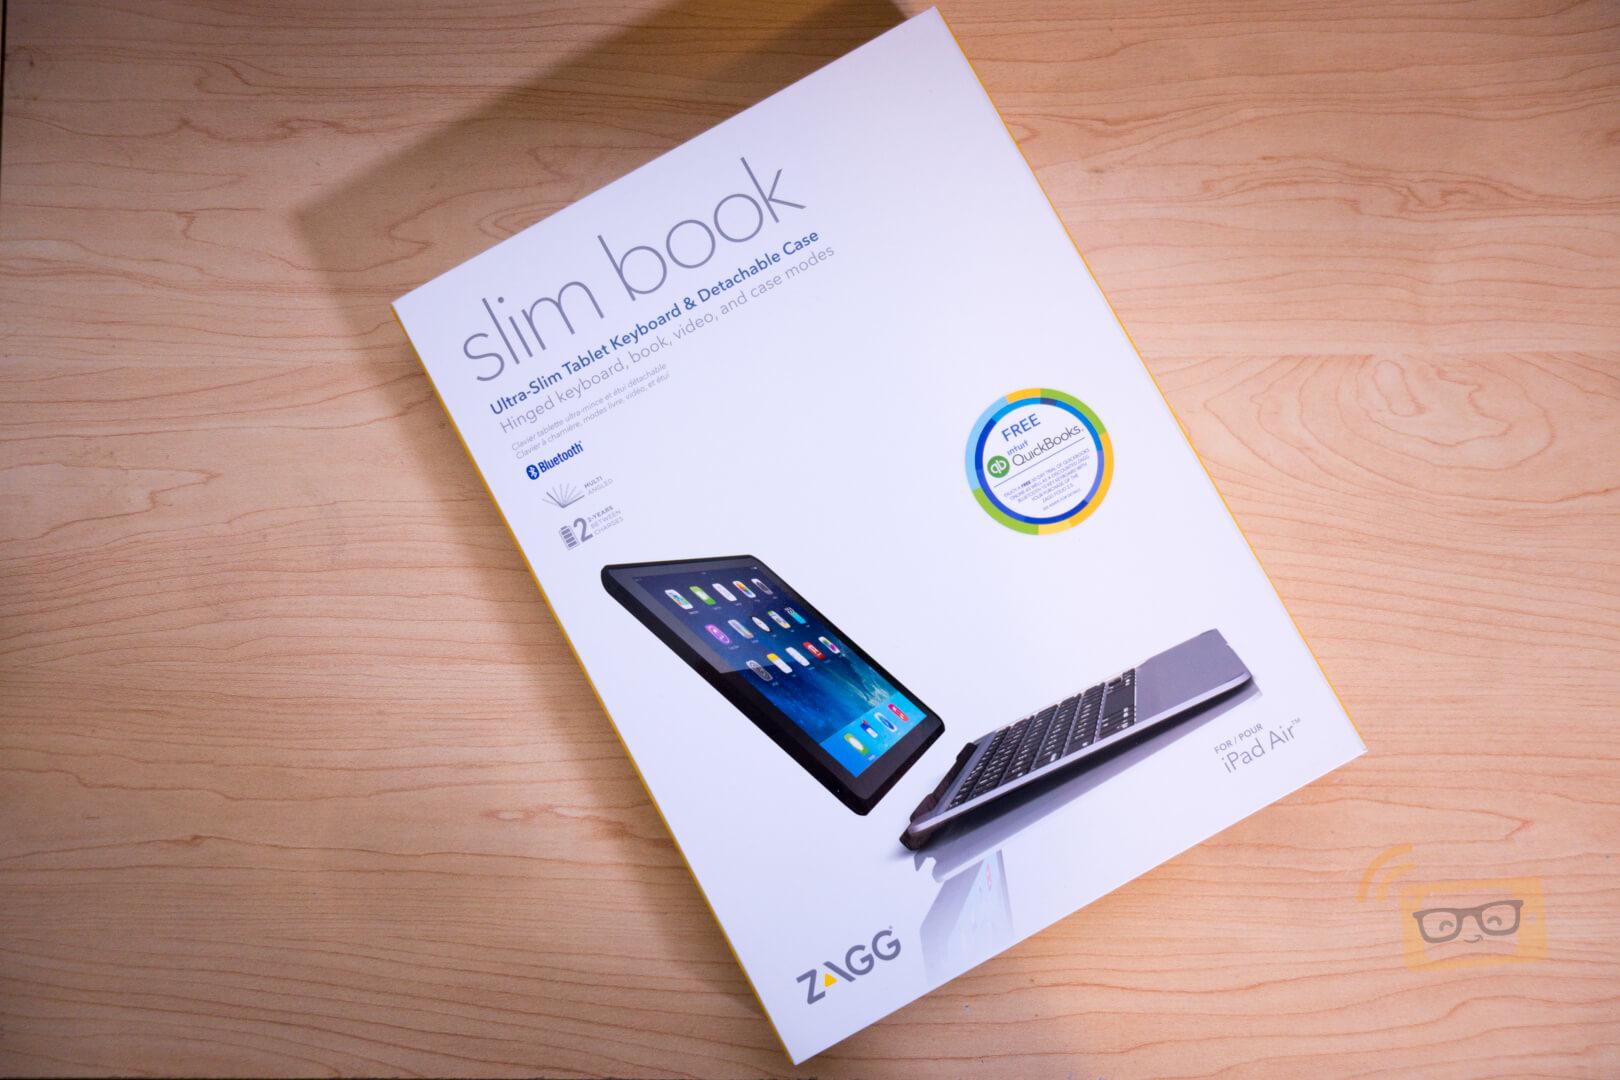 Review Zagg Slim Book Pocket Insider